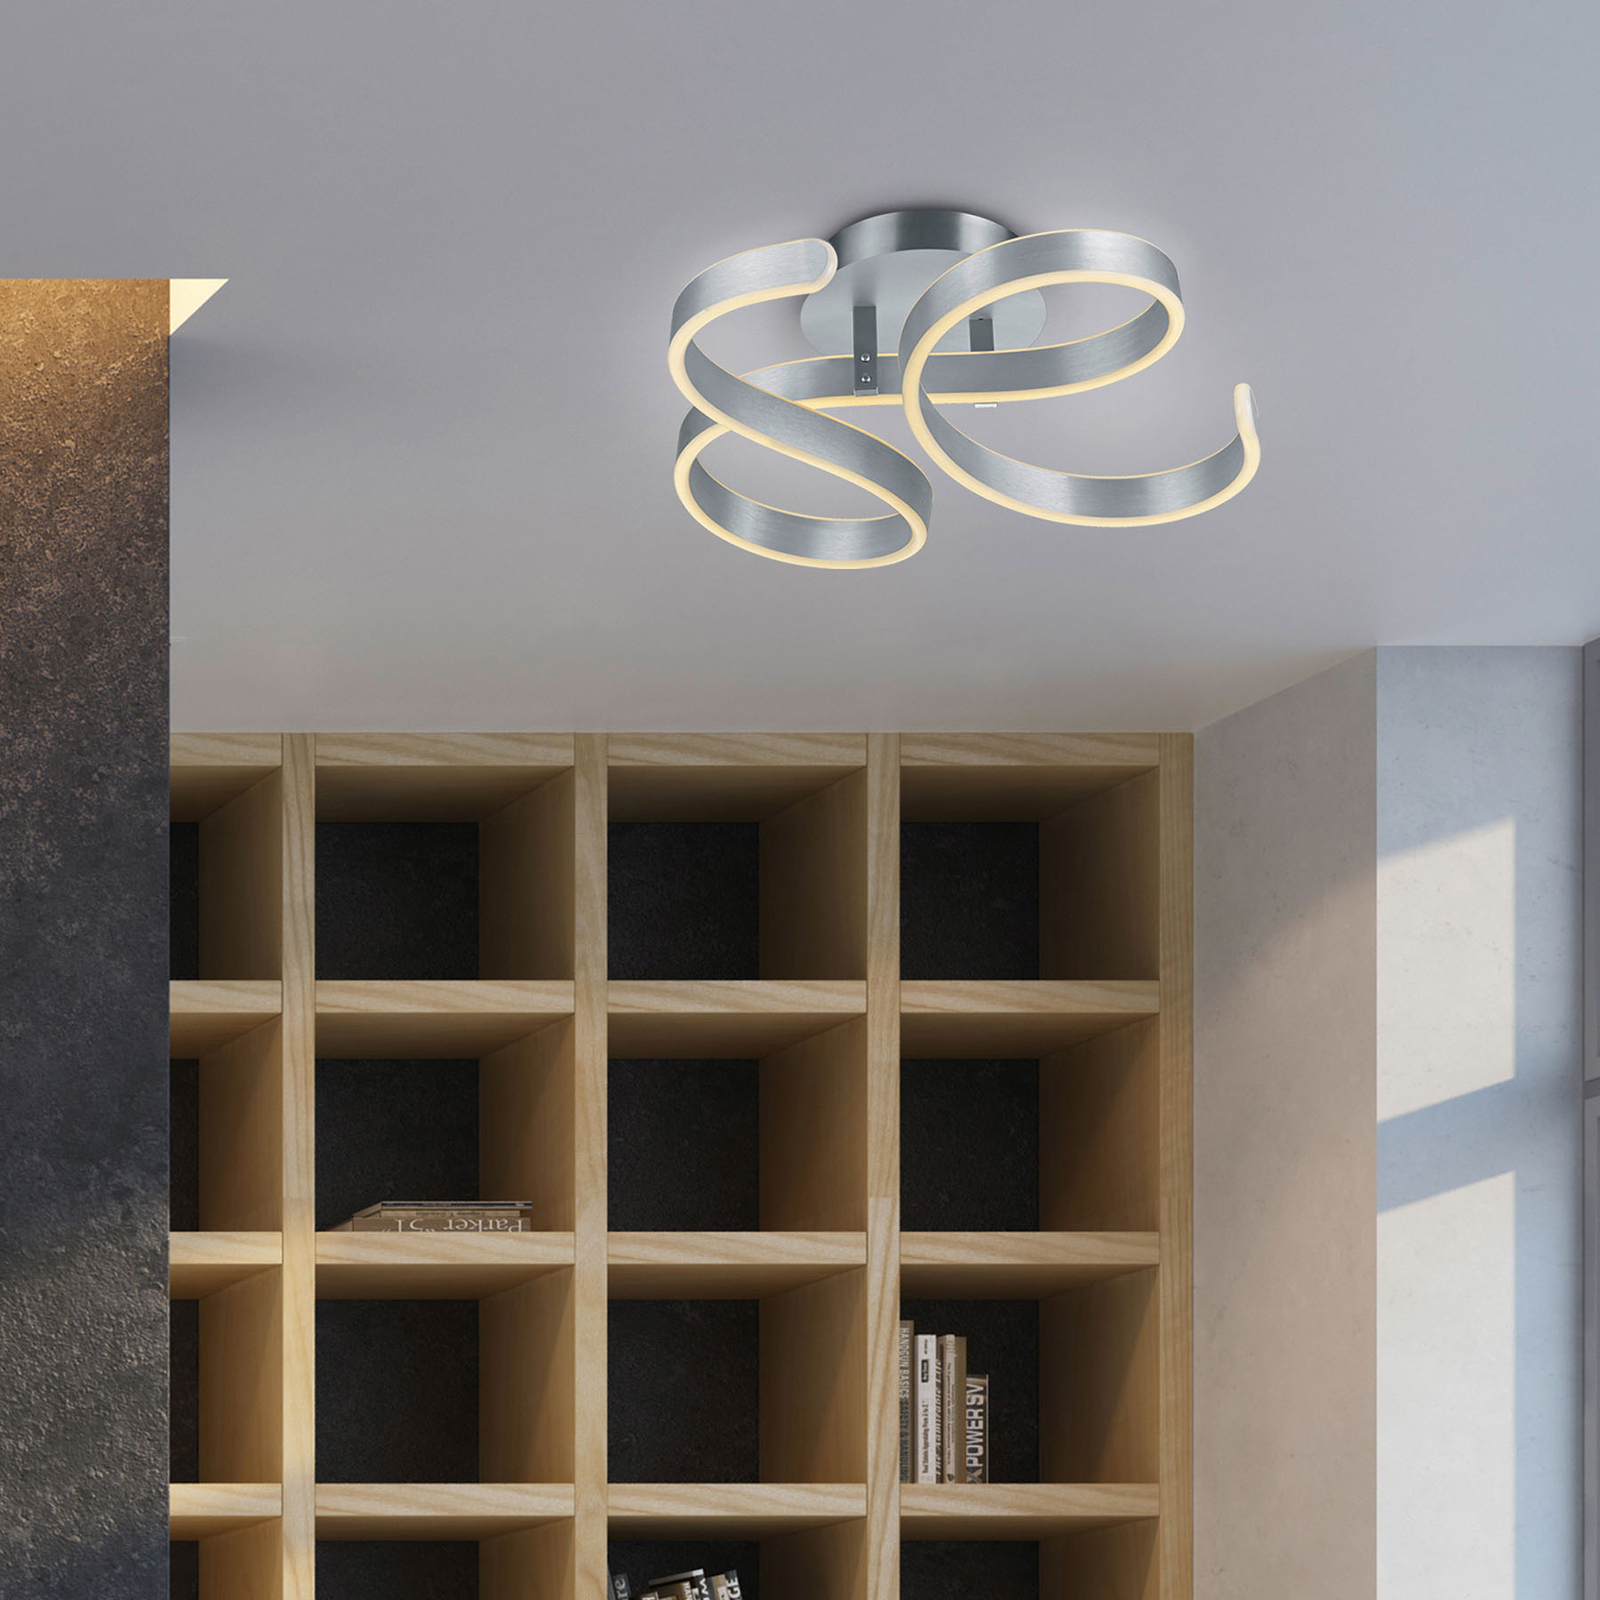 LED-kattovalaisin Francis, harjattu alumiini